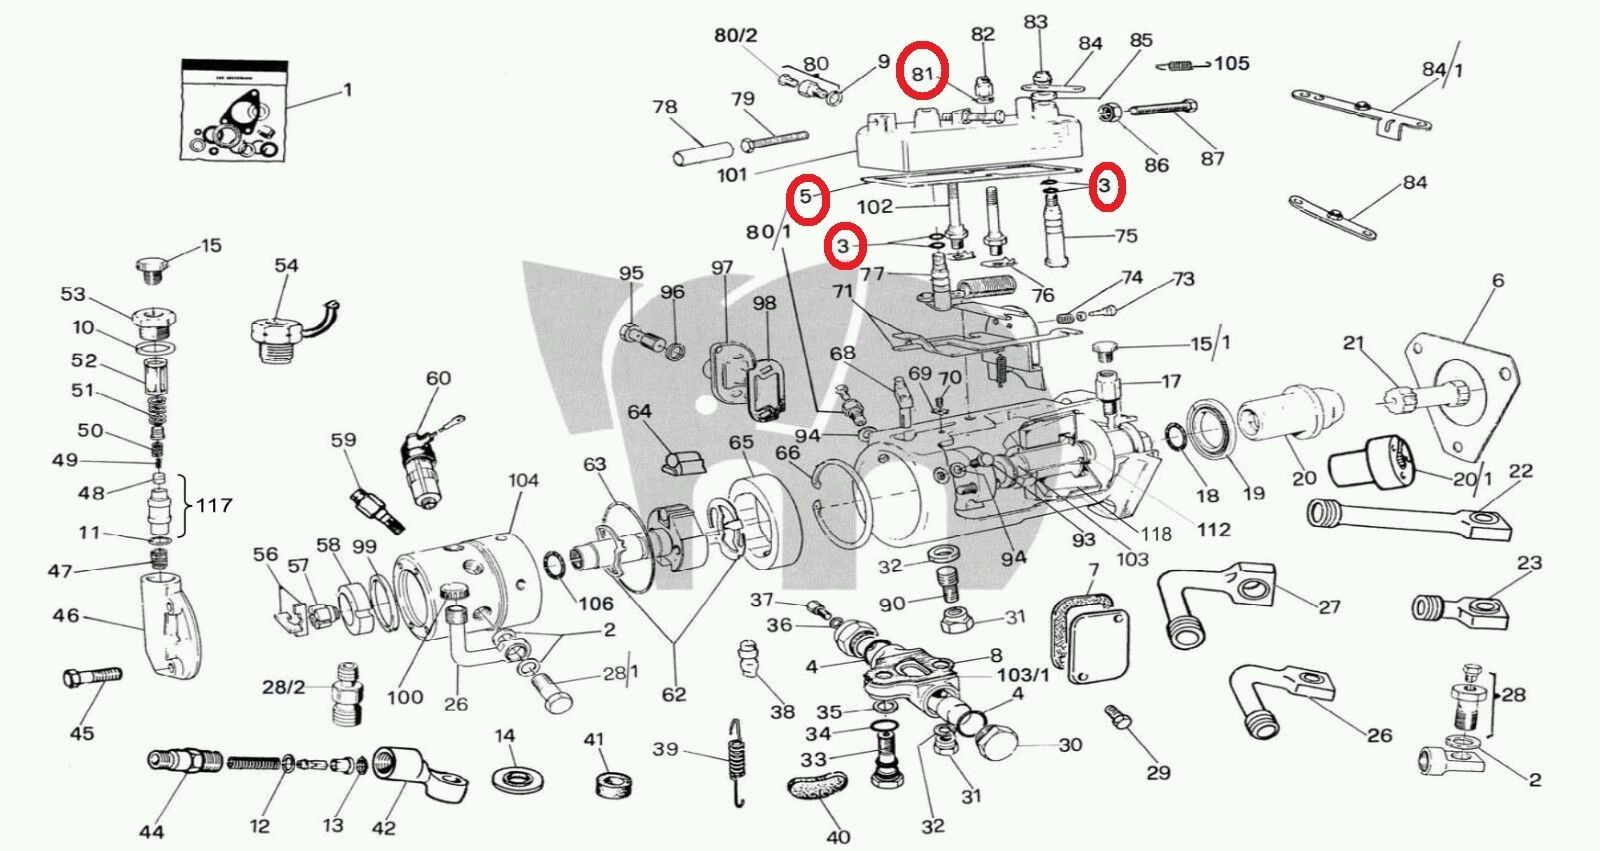 Cav Dpa Top Cover Gasket Fuel Leak Lucas and 35 similar items